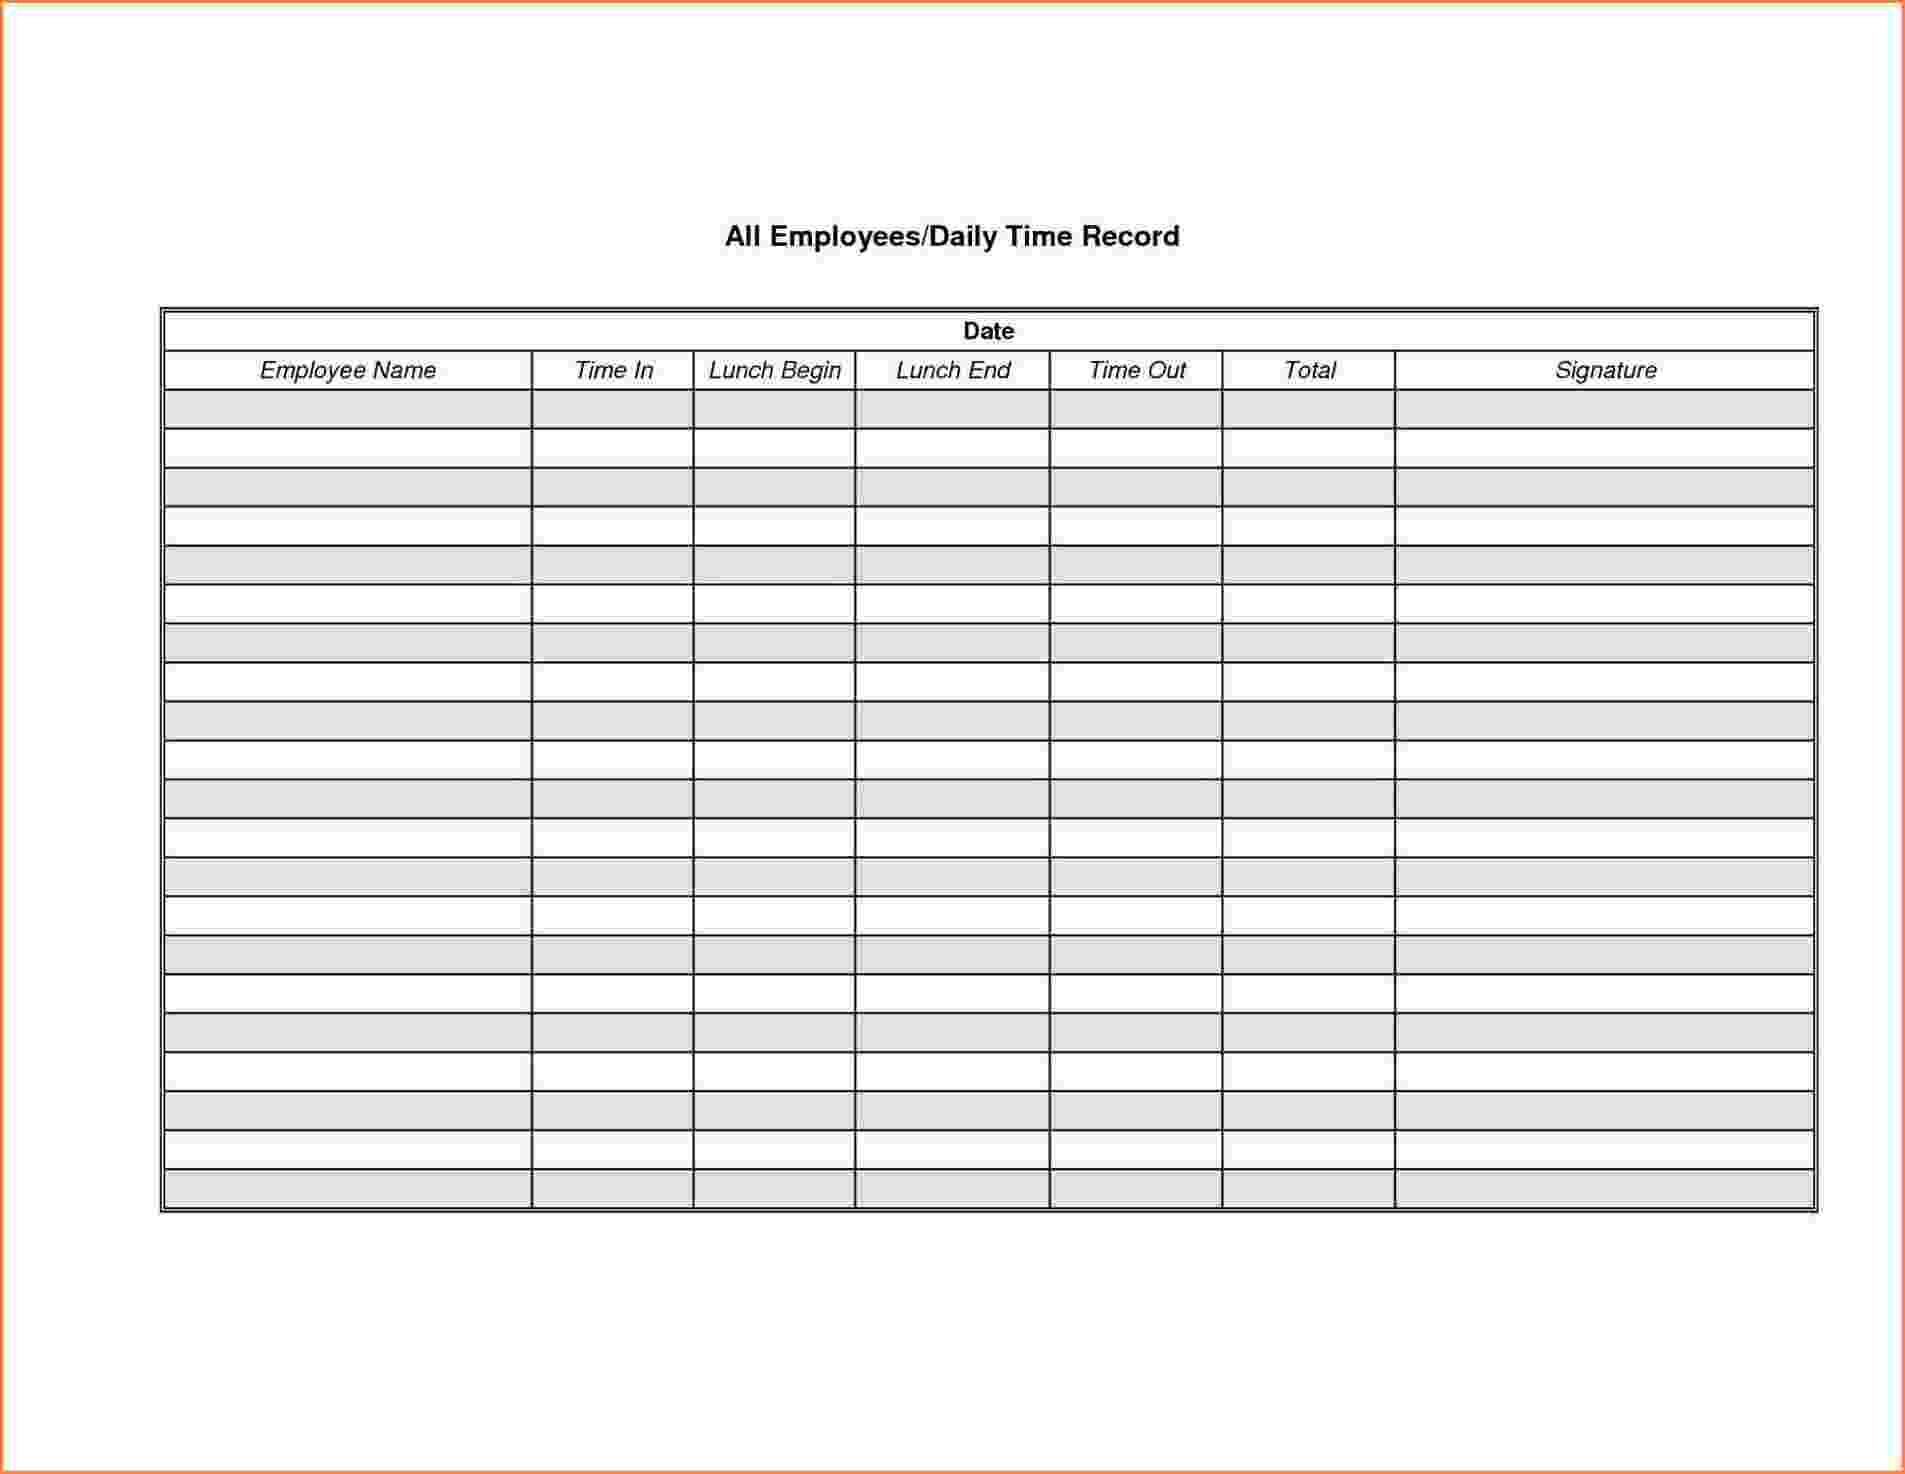 021 Employee Payroll Bud Worksheet Best Solutions Of